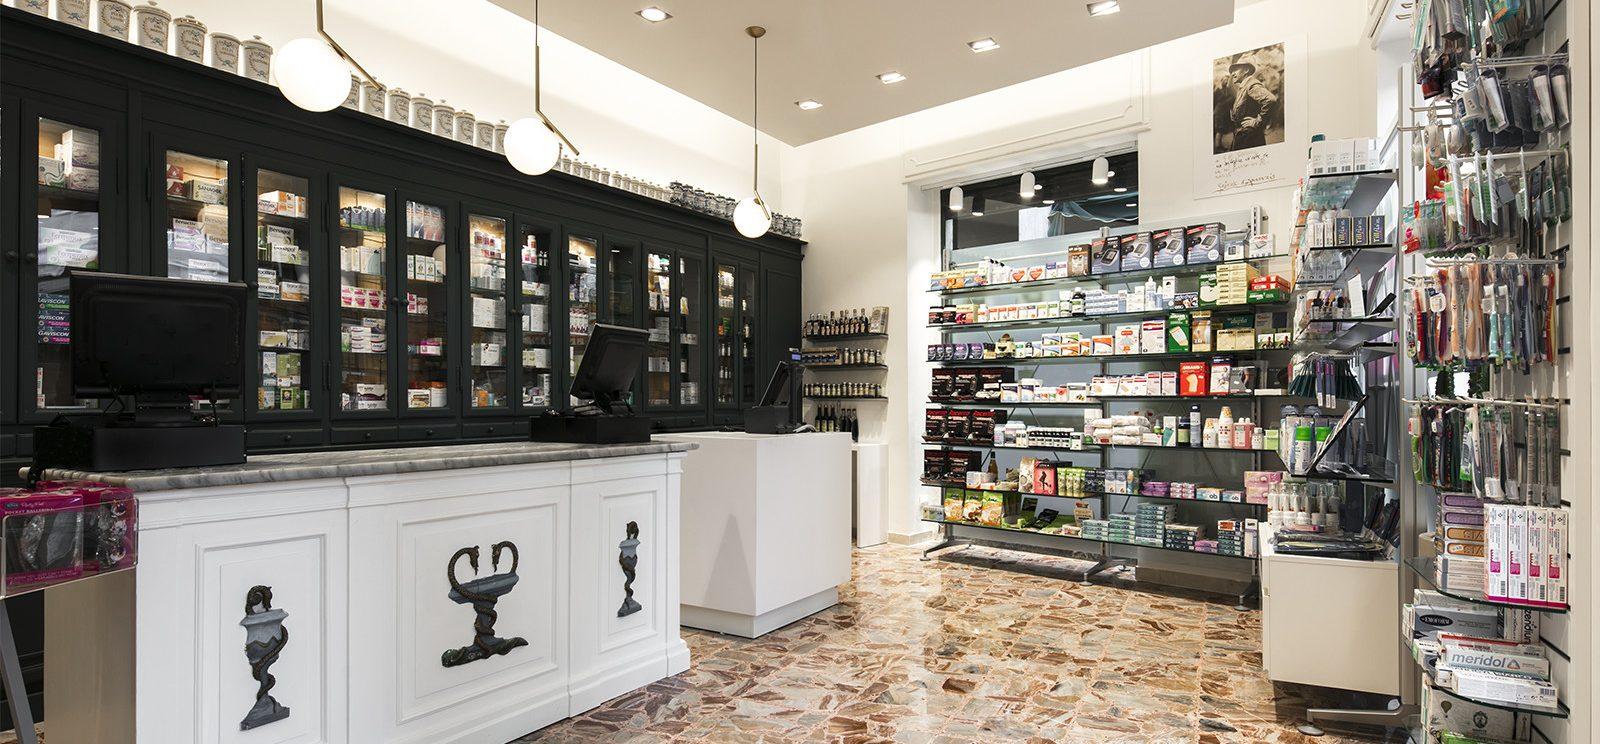 Farmacia Internazionale Storari, Gardone Riviera (BS)